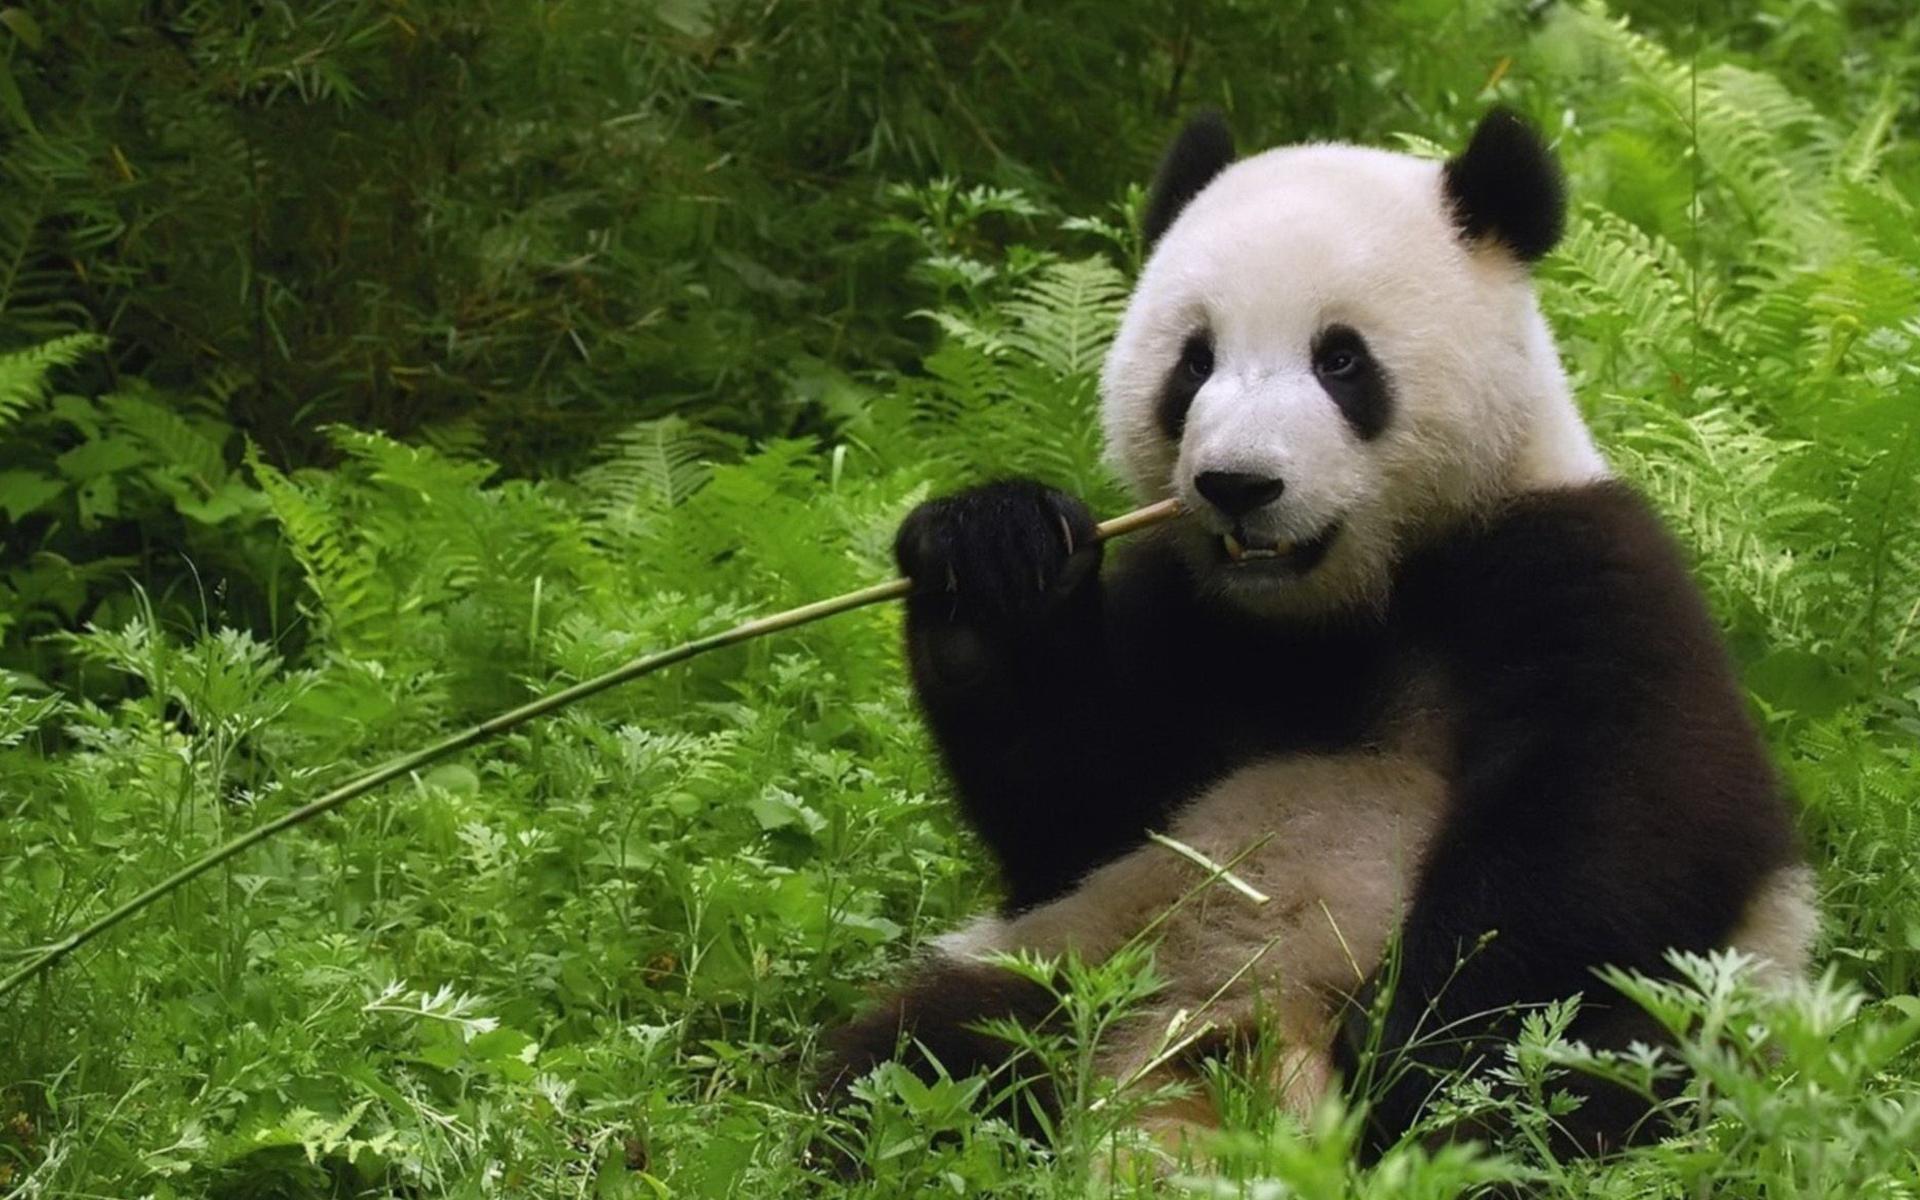 PANDA EATING BAMBOO!